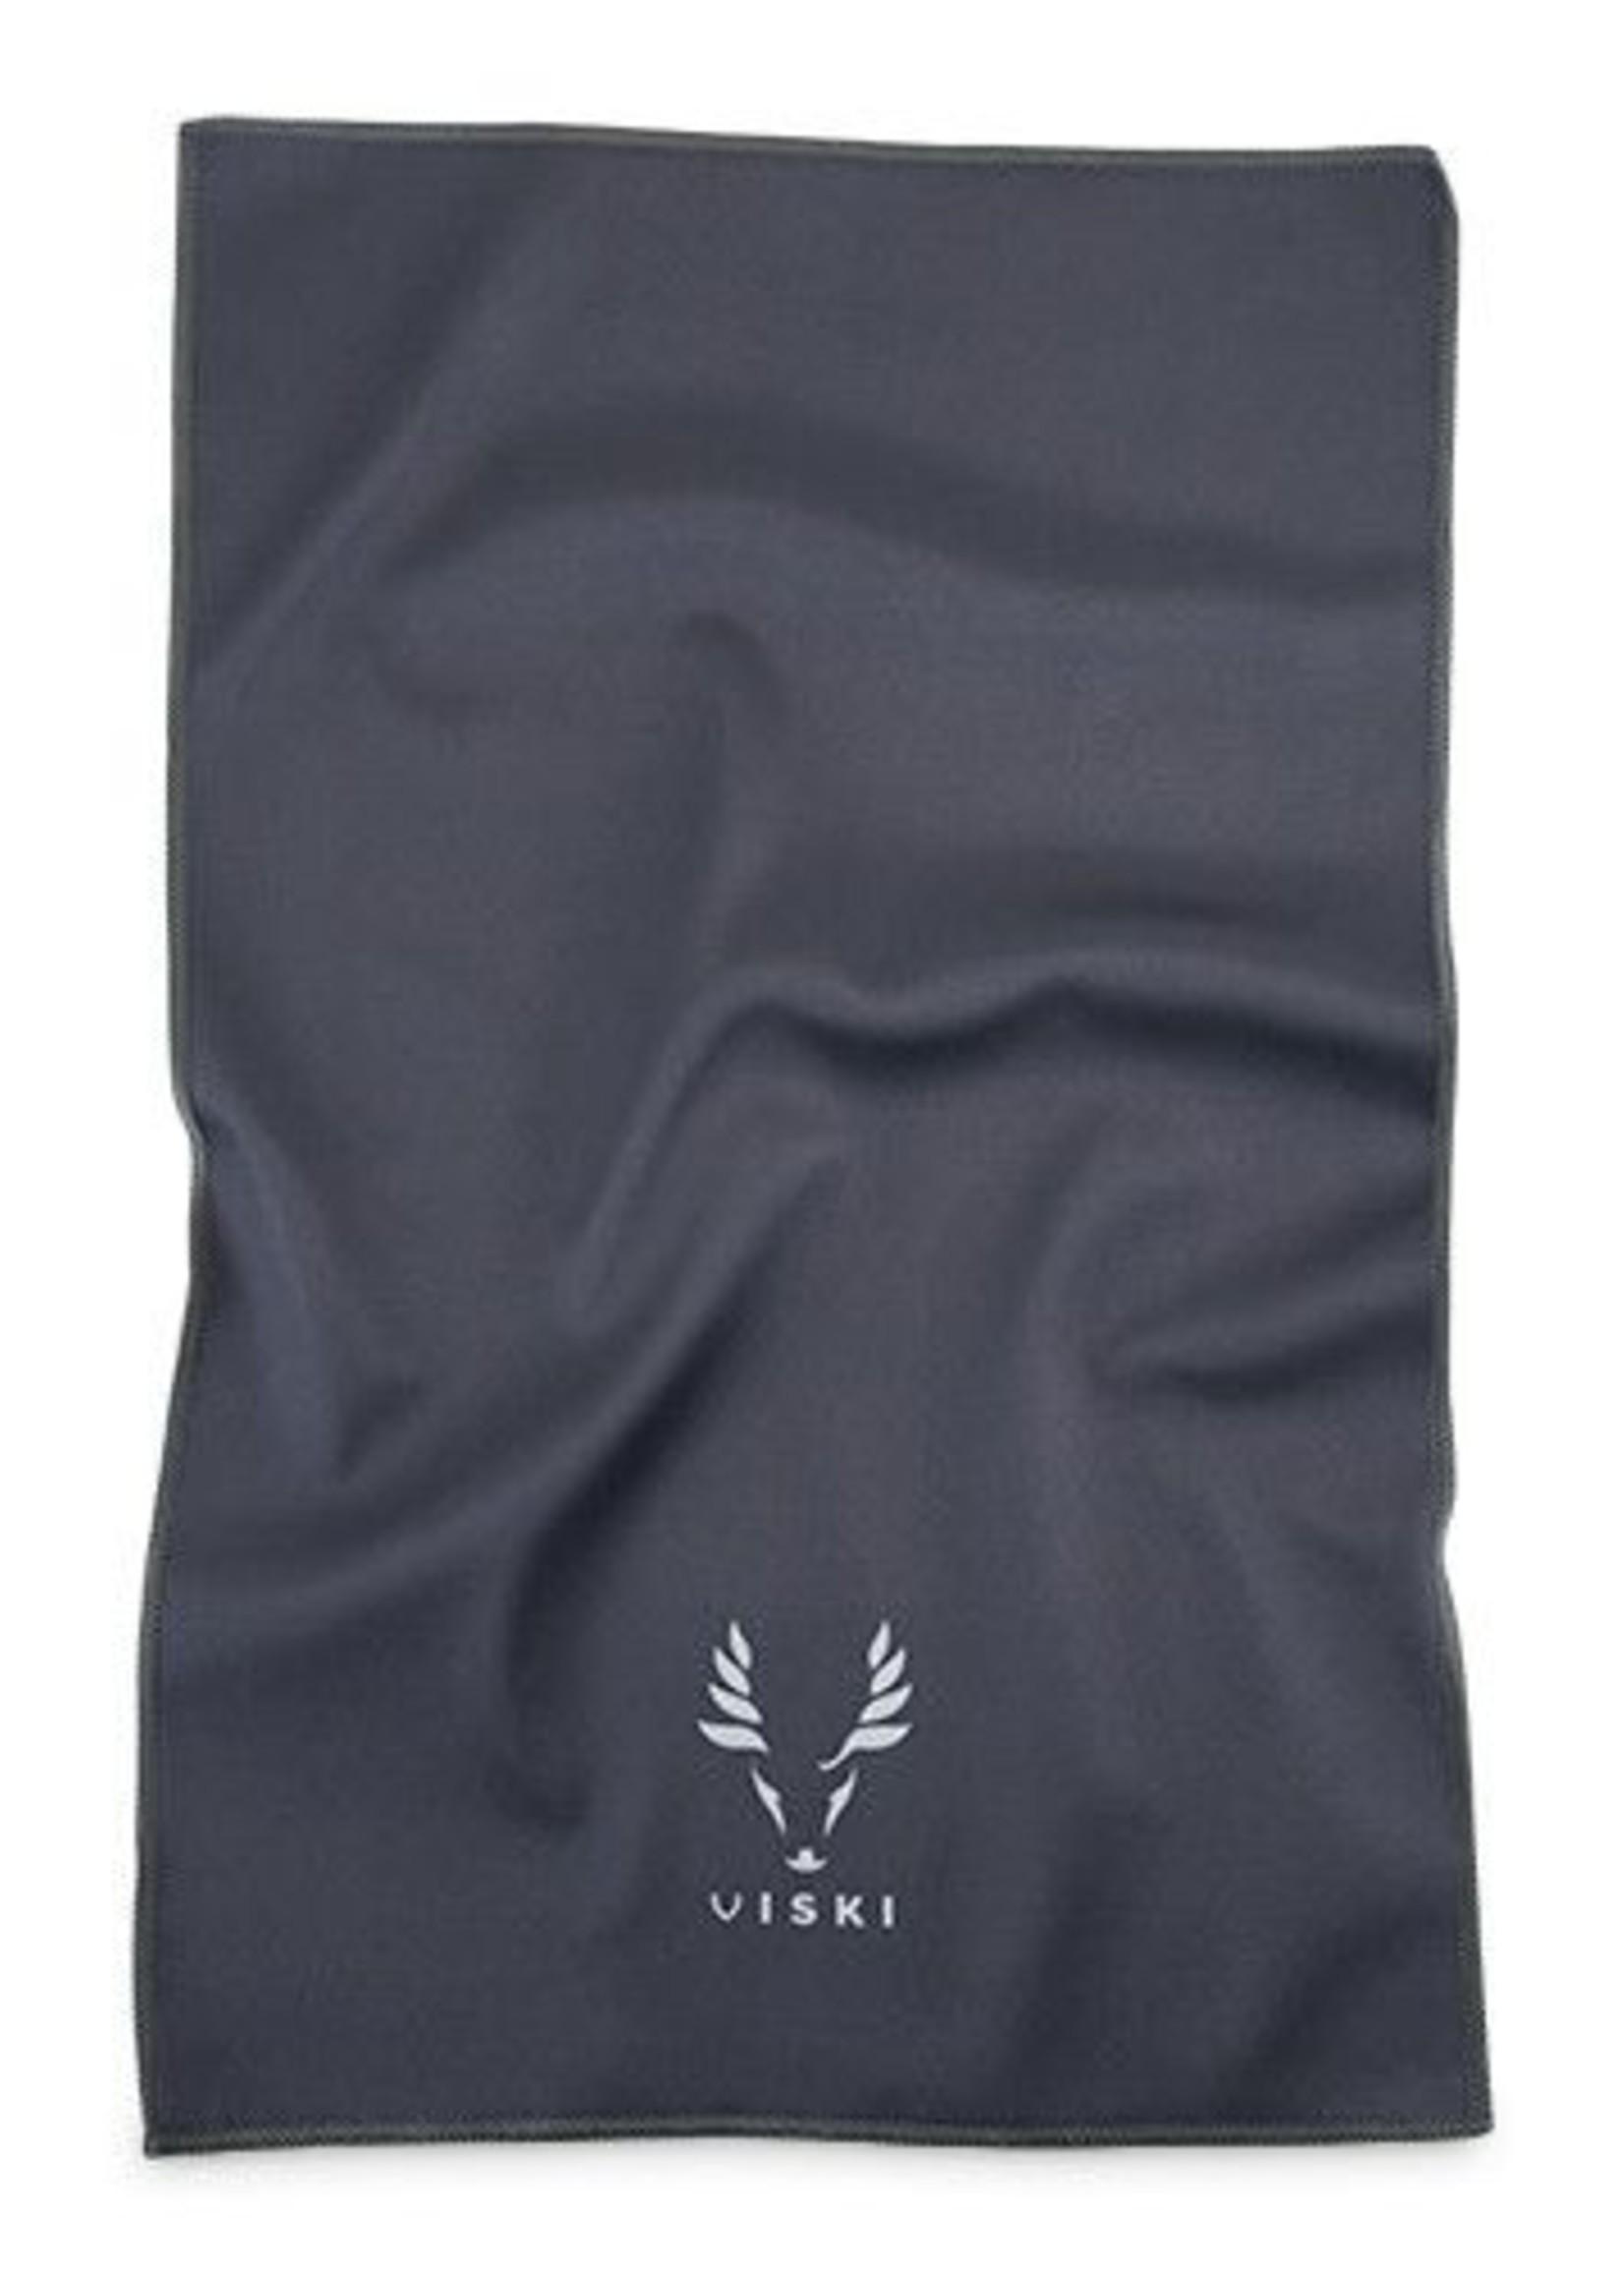 Viski Viski Professional: Microfiber Cleaning Cloth